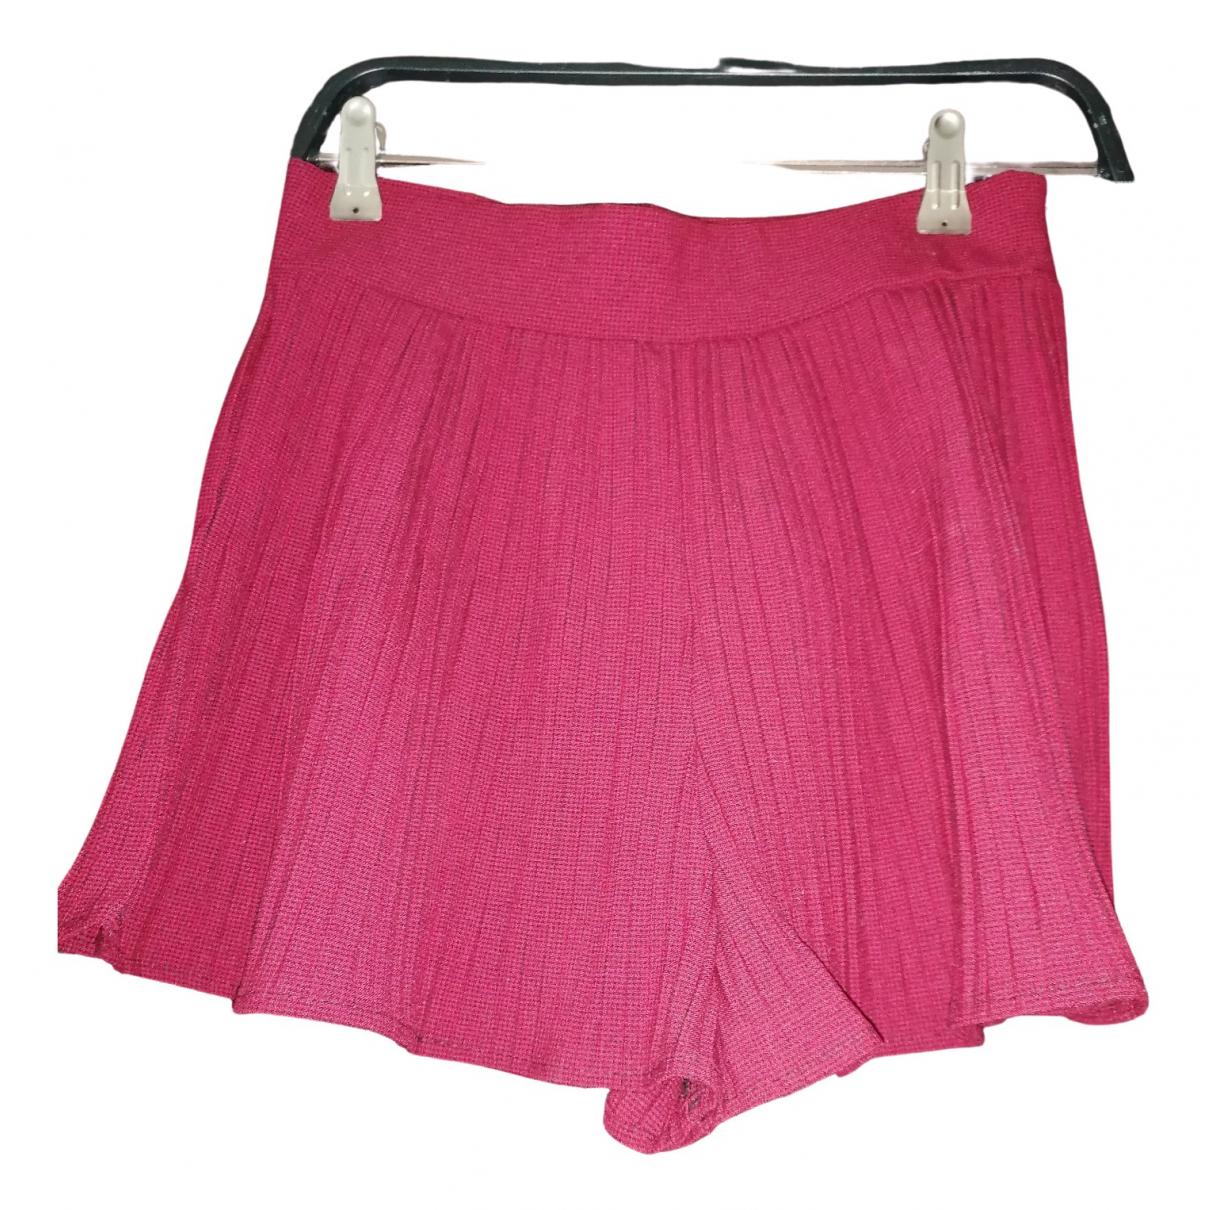 Zara \N Burgundy Shorts for Women S International